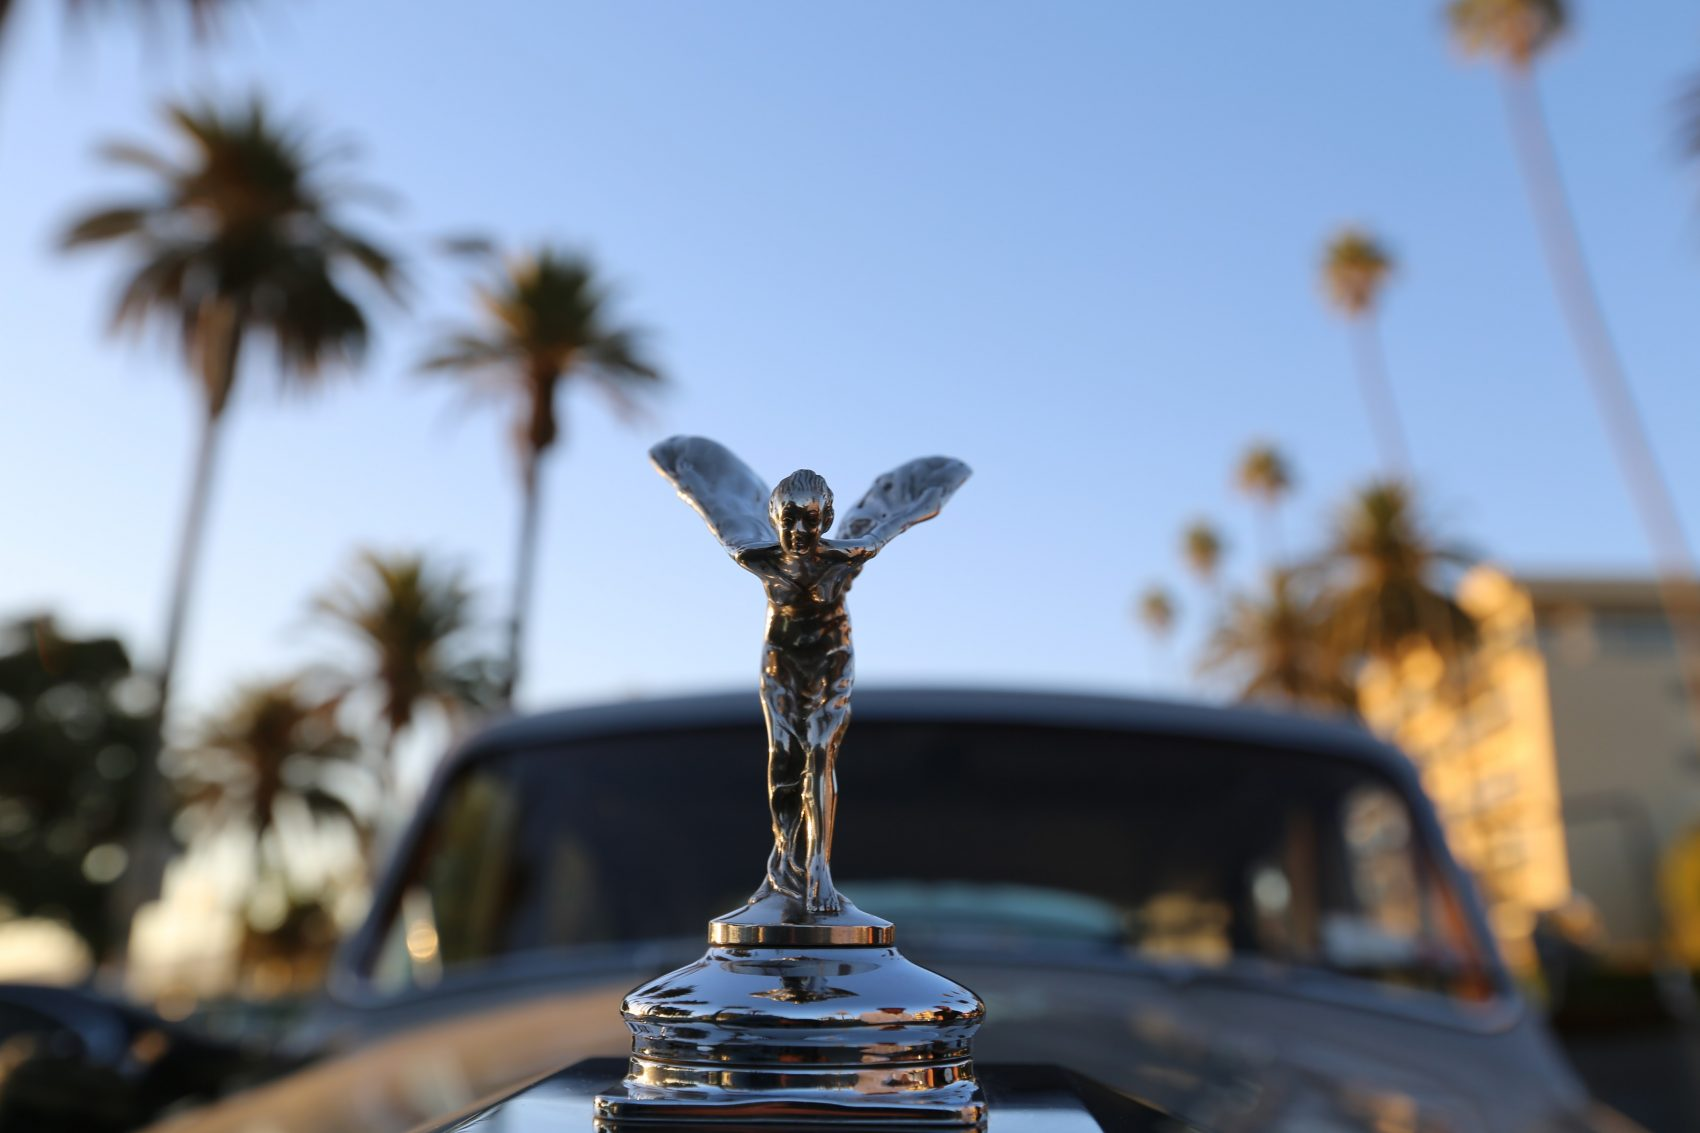 Elvis Presley's 1963 Rolls-Royce in Santa Monica, California. (Courtesy David Kuhn/Oscilloscope Laboratories)